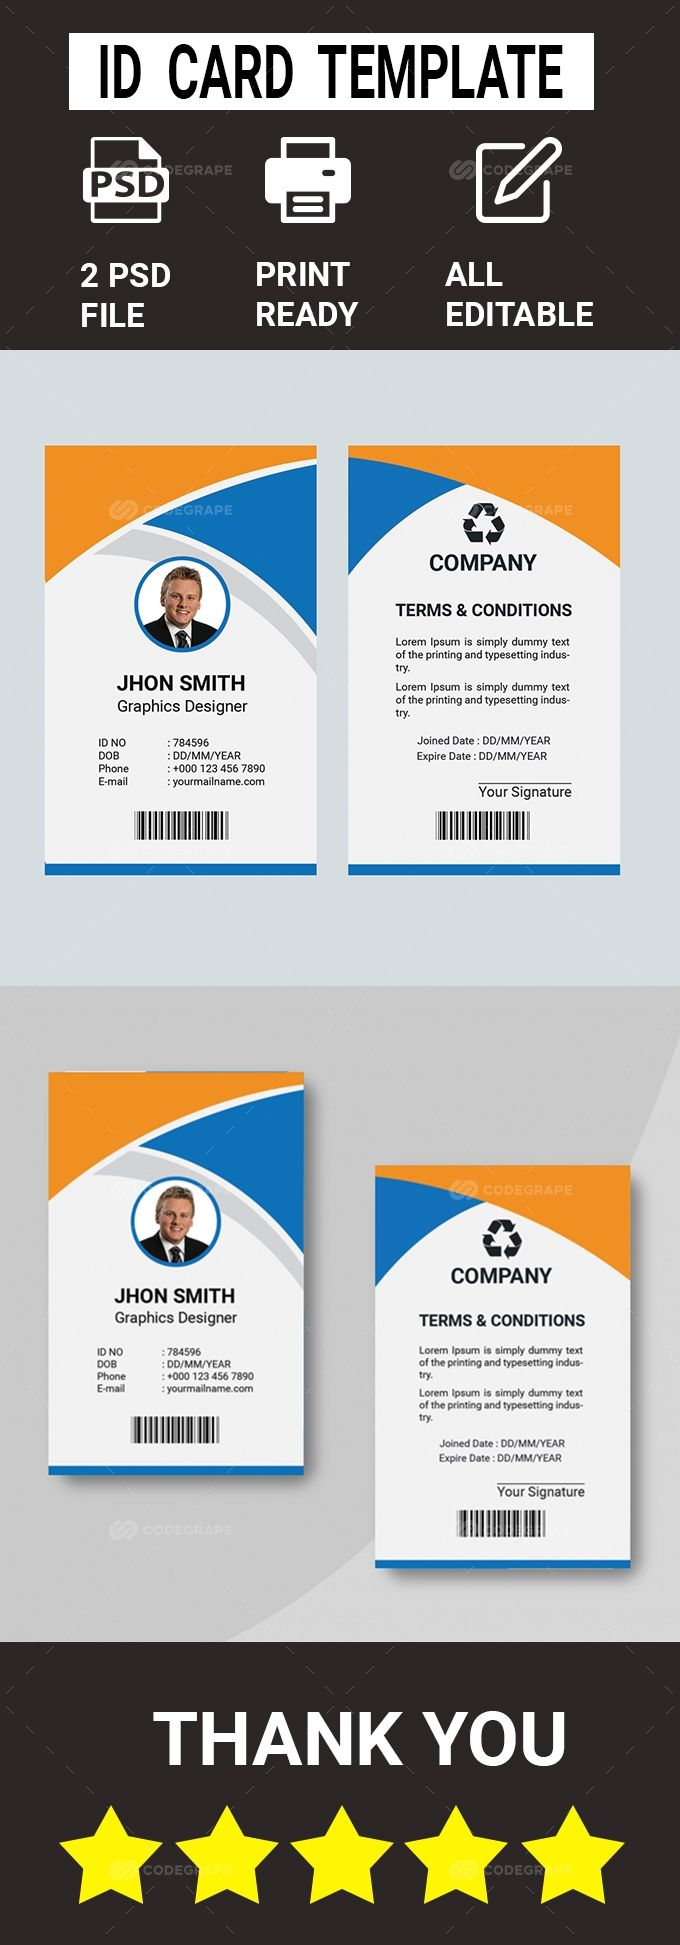 Id Card Template In 2020 Id Card Template Card Template Templates